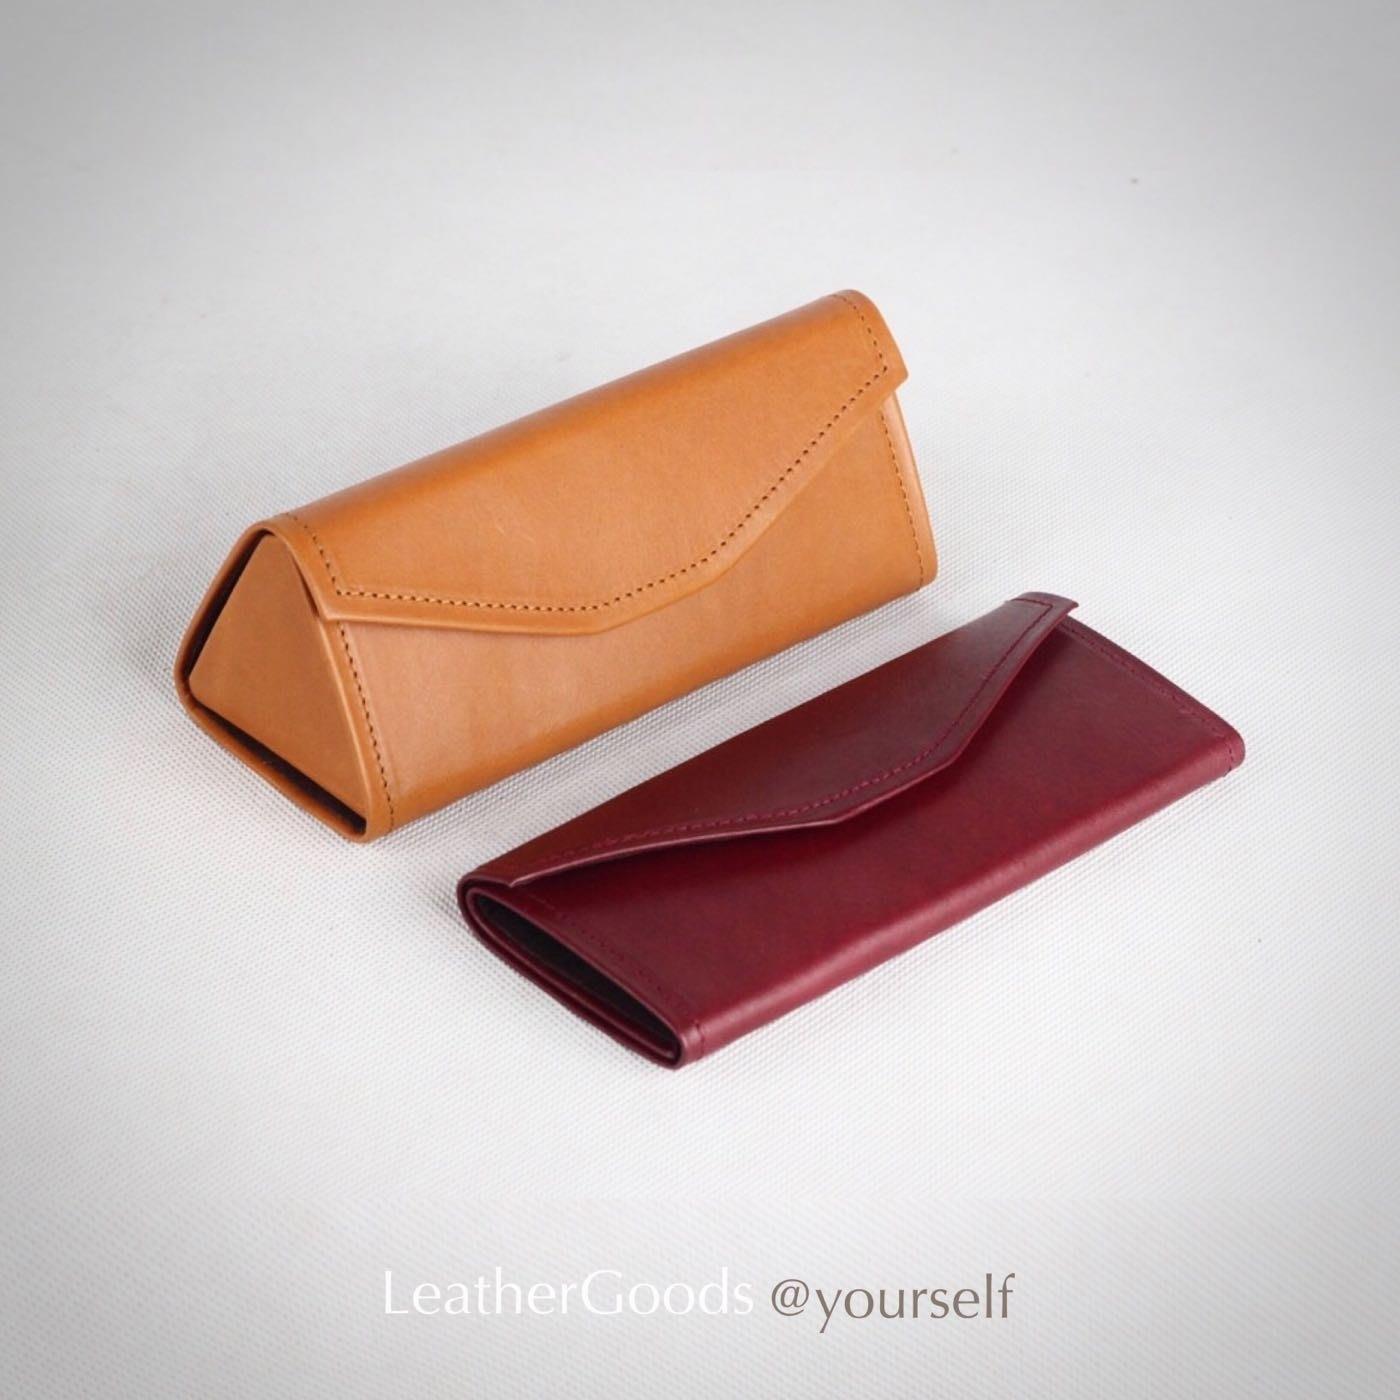 LeatherGoods丨A級頭層植鞣牛皮 折疊眼鏡盒